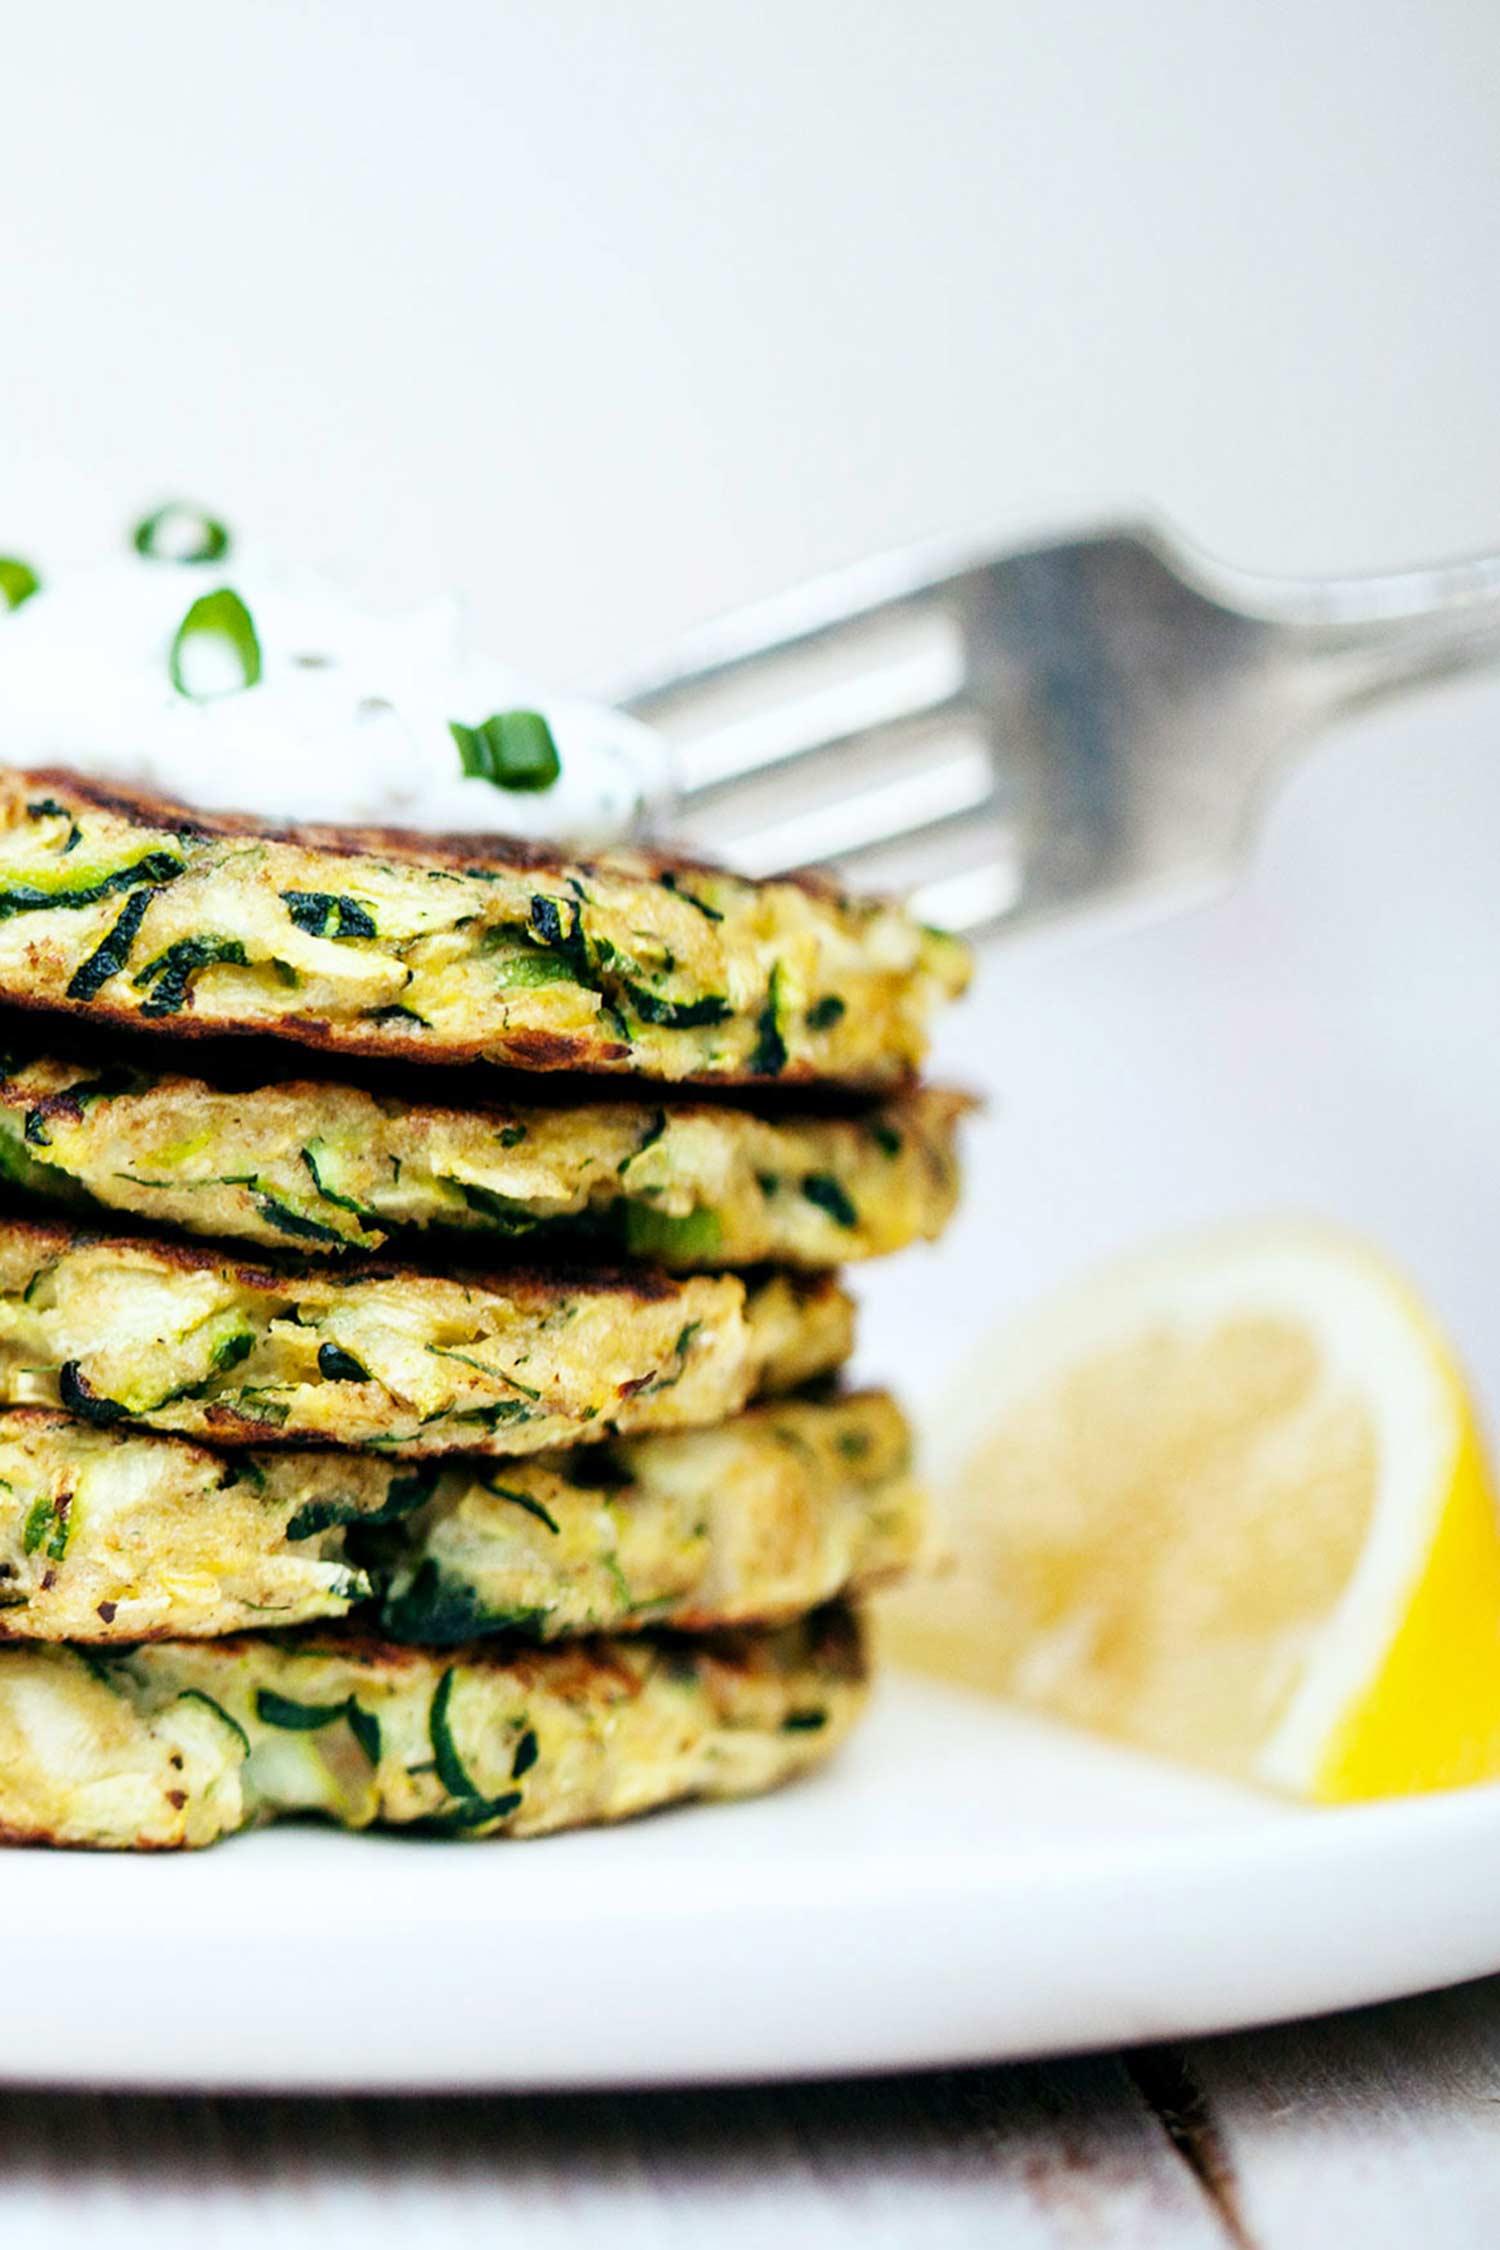 Zucchini-Fritters-with-Lemon-Dill-Yogurt-Sauce-Evergreen-Kitchen-1.jpg